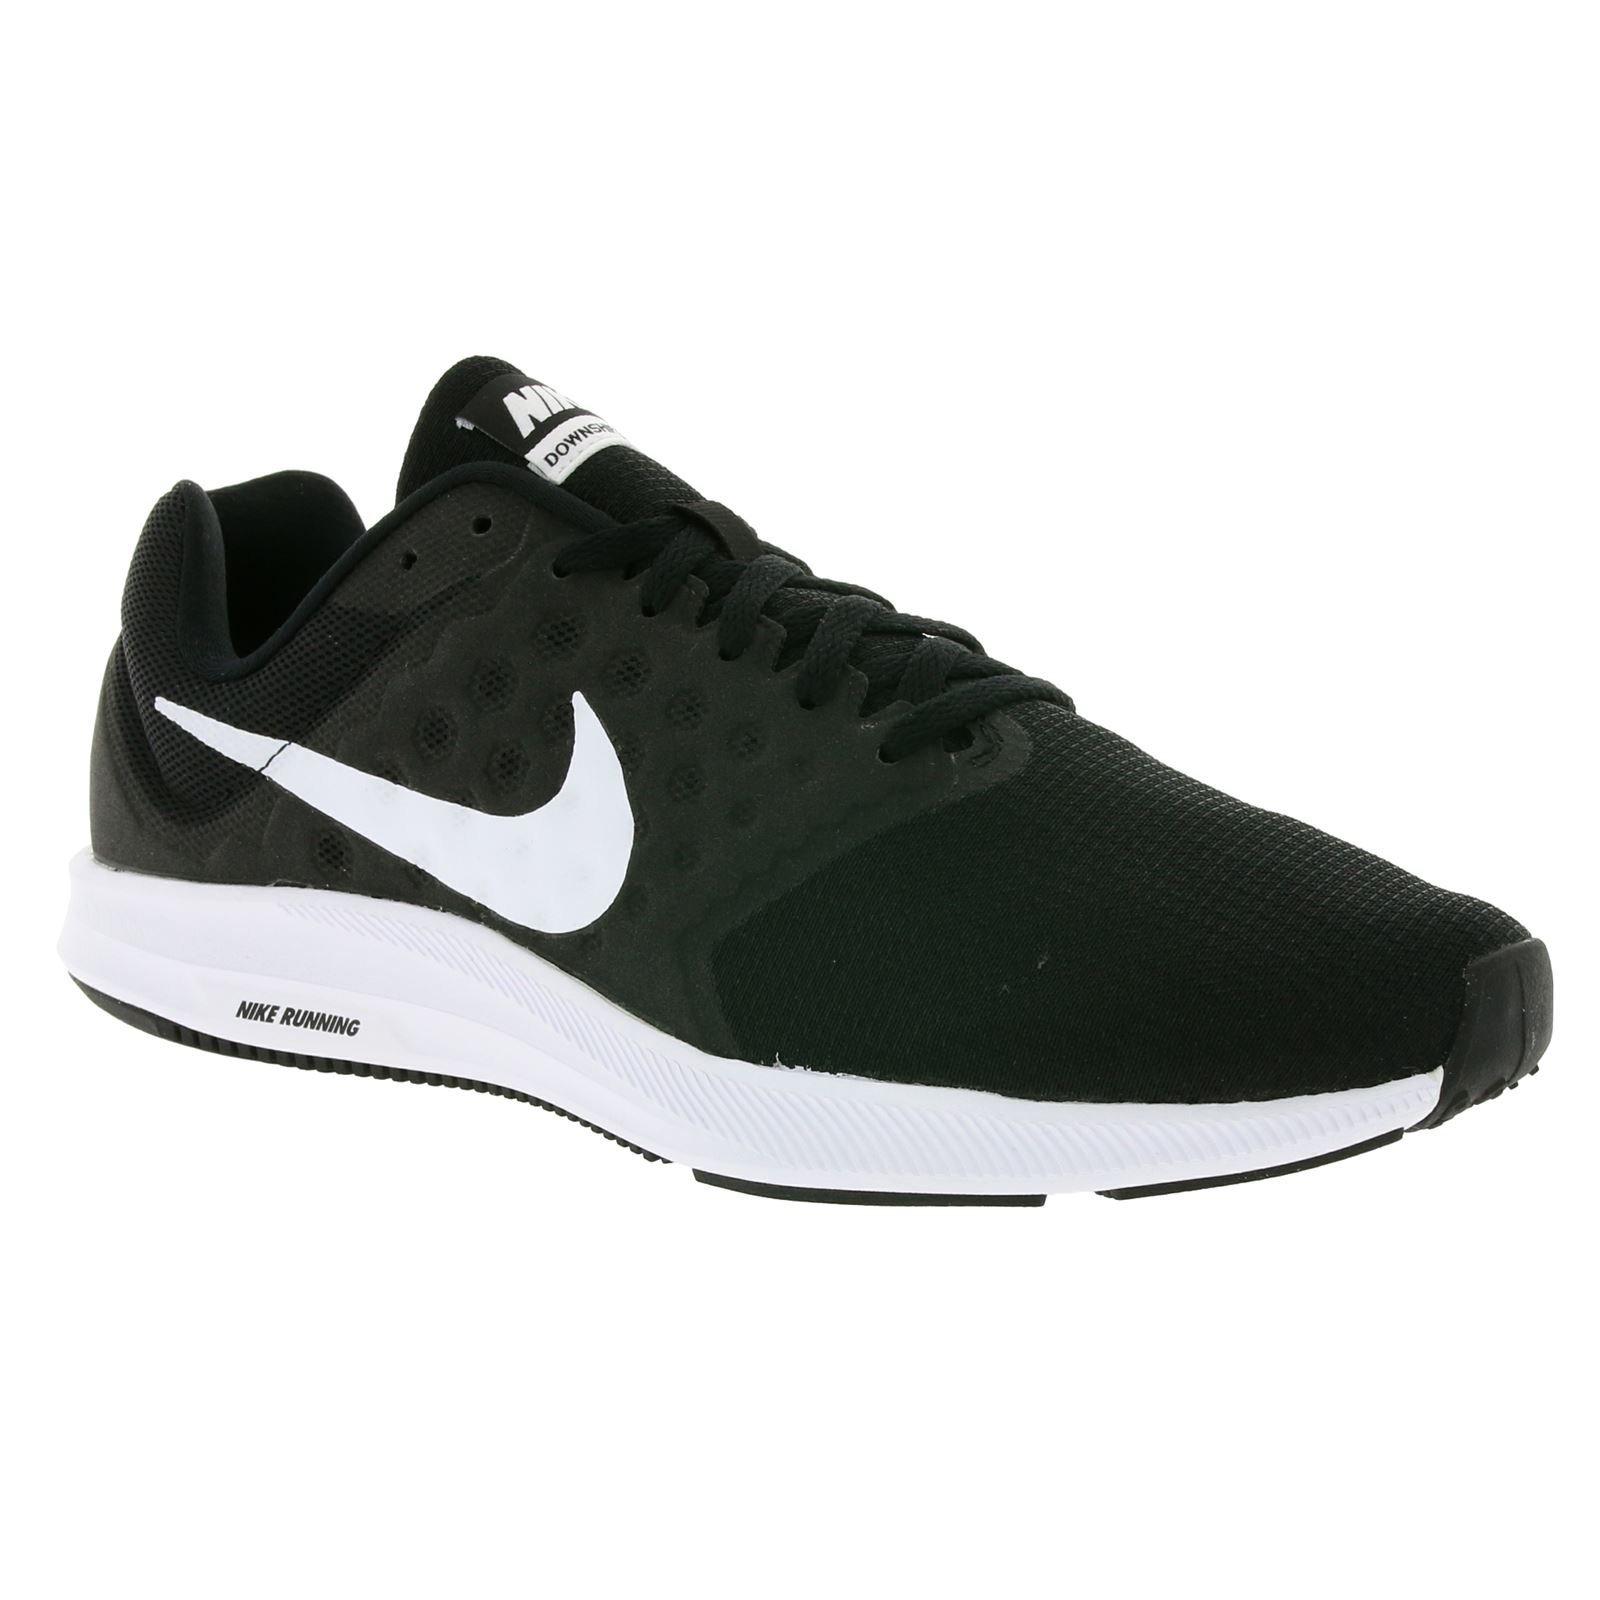 8 Herren Downshifter Downshifter LaufschuheSchwarzblackwhite 8 LaufschuheSchwarzblackwhite Nike Herren Herren Nike Nike Yb76yvfg